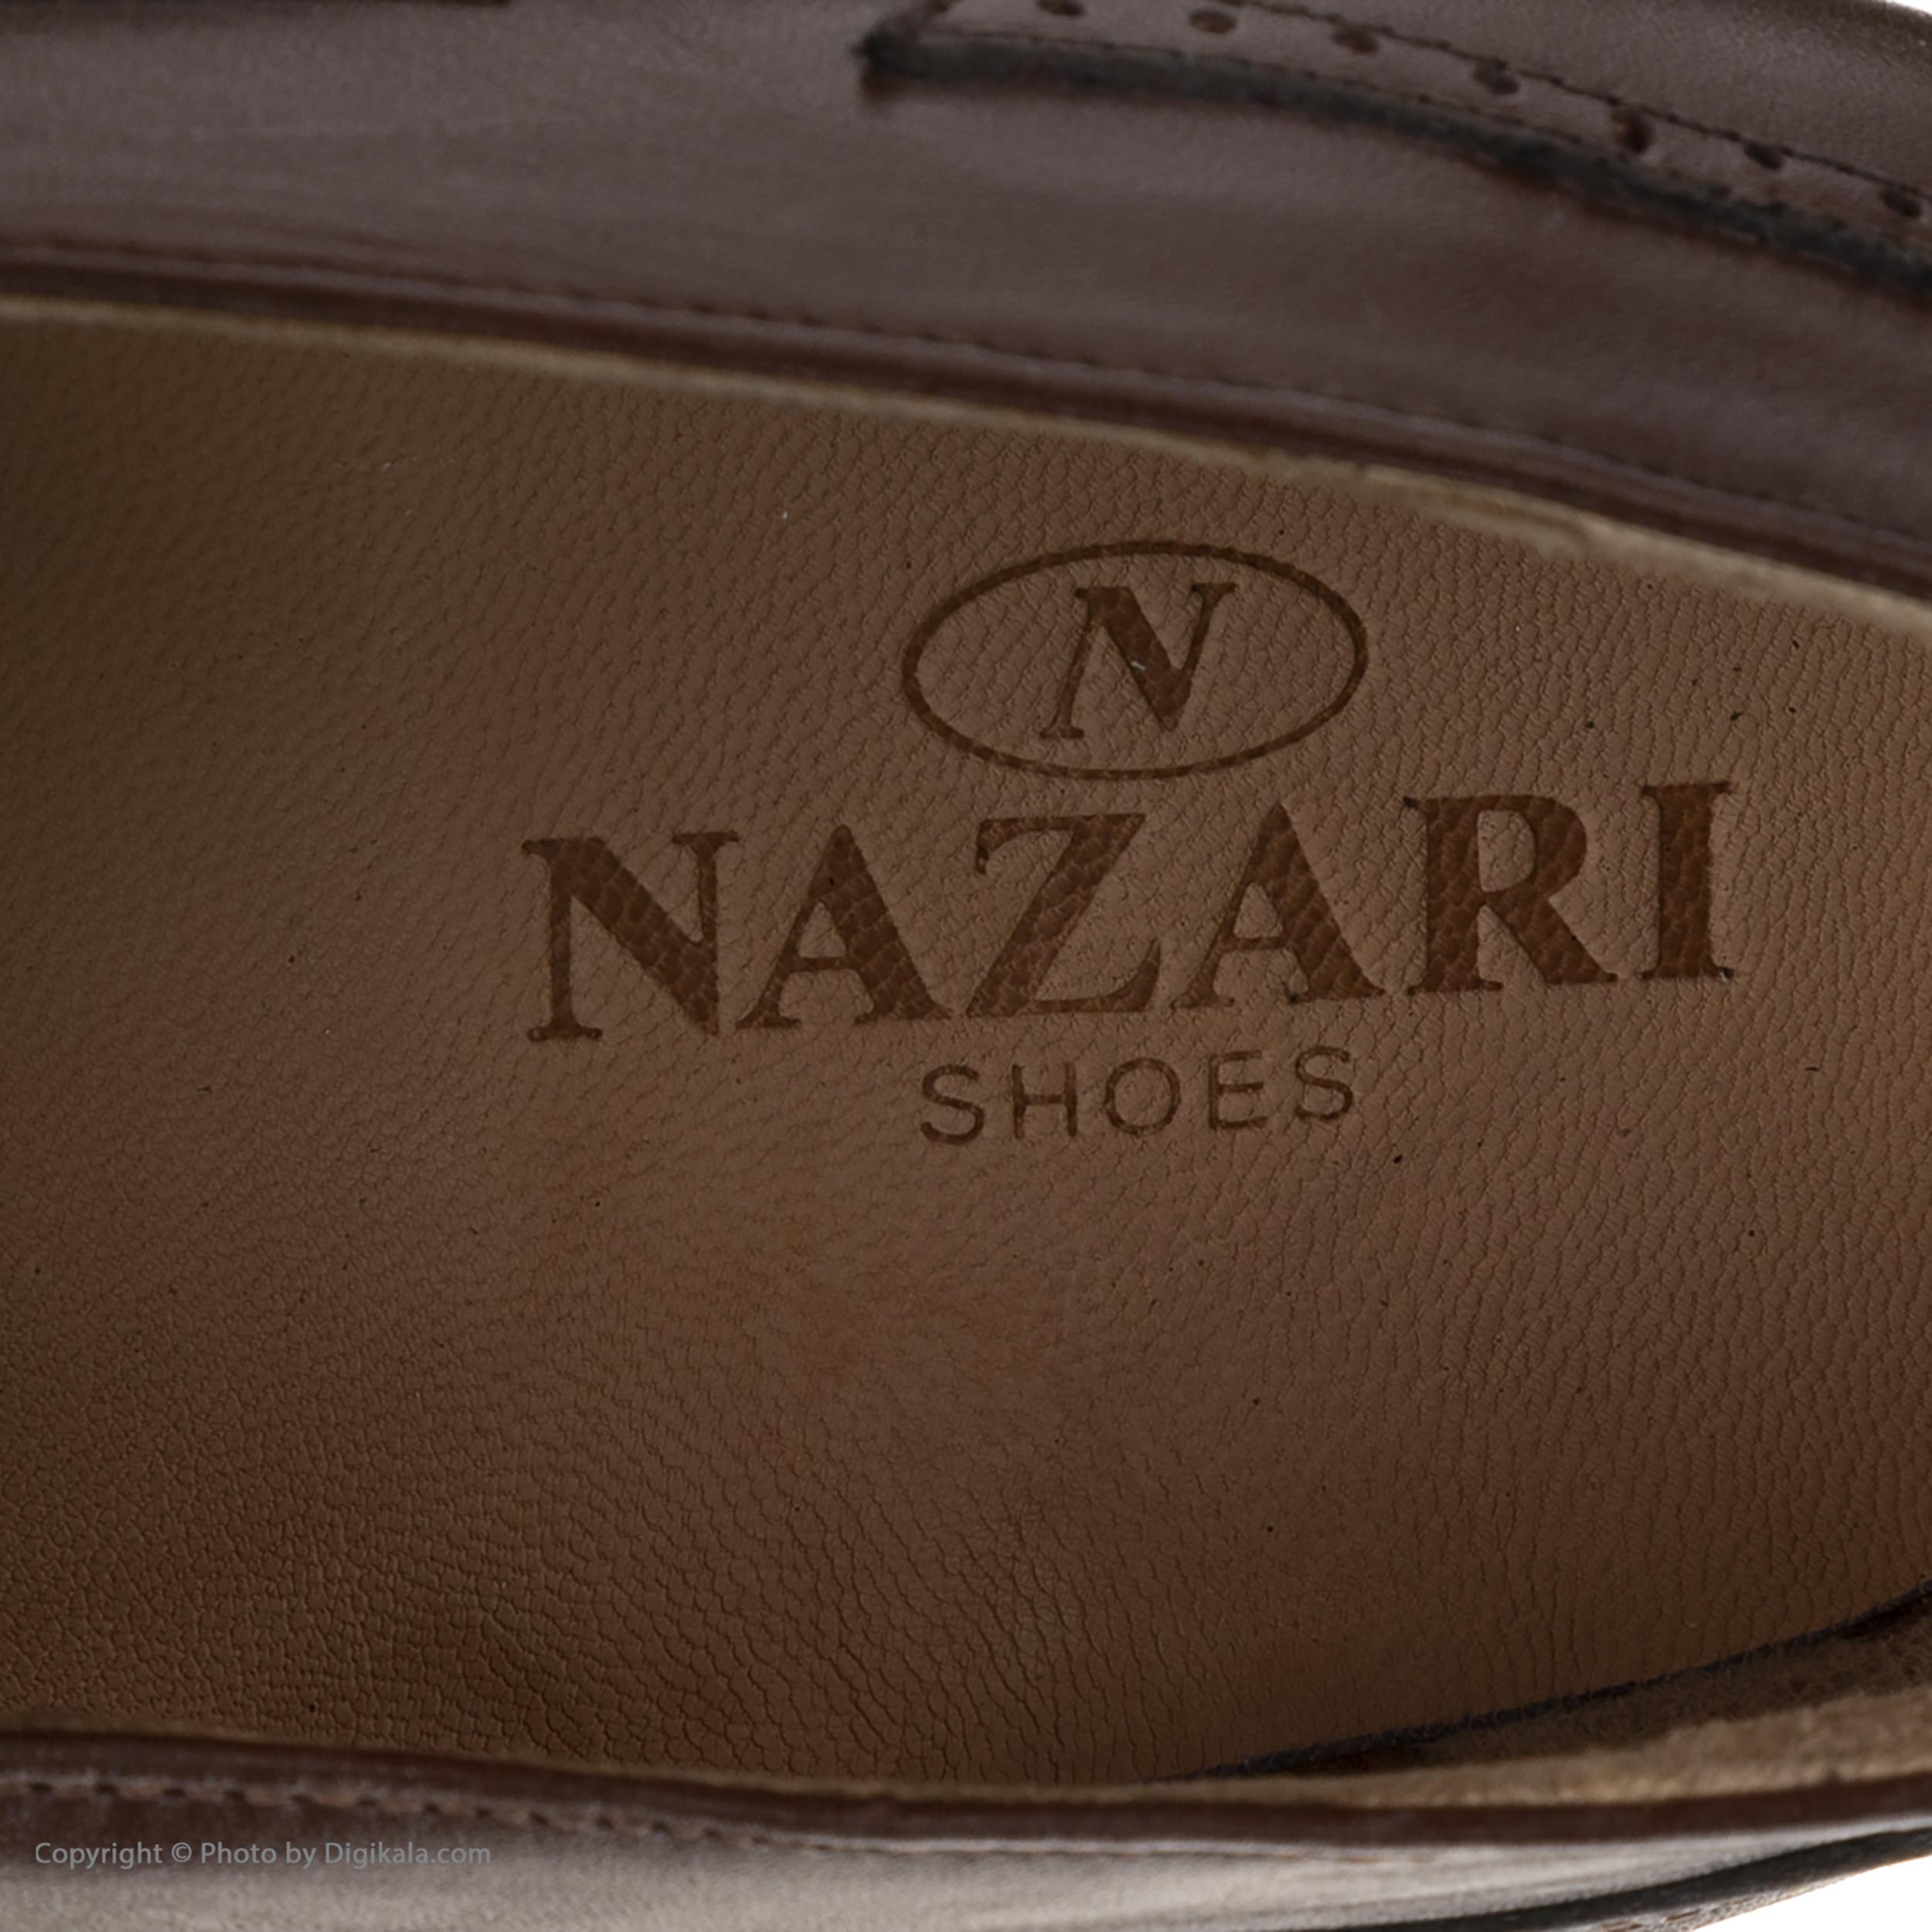 کفش مردانه نظری کد 434 -  - 8